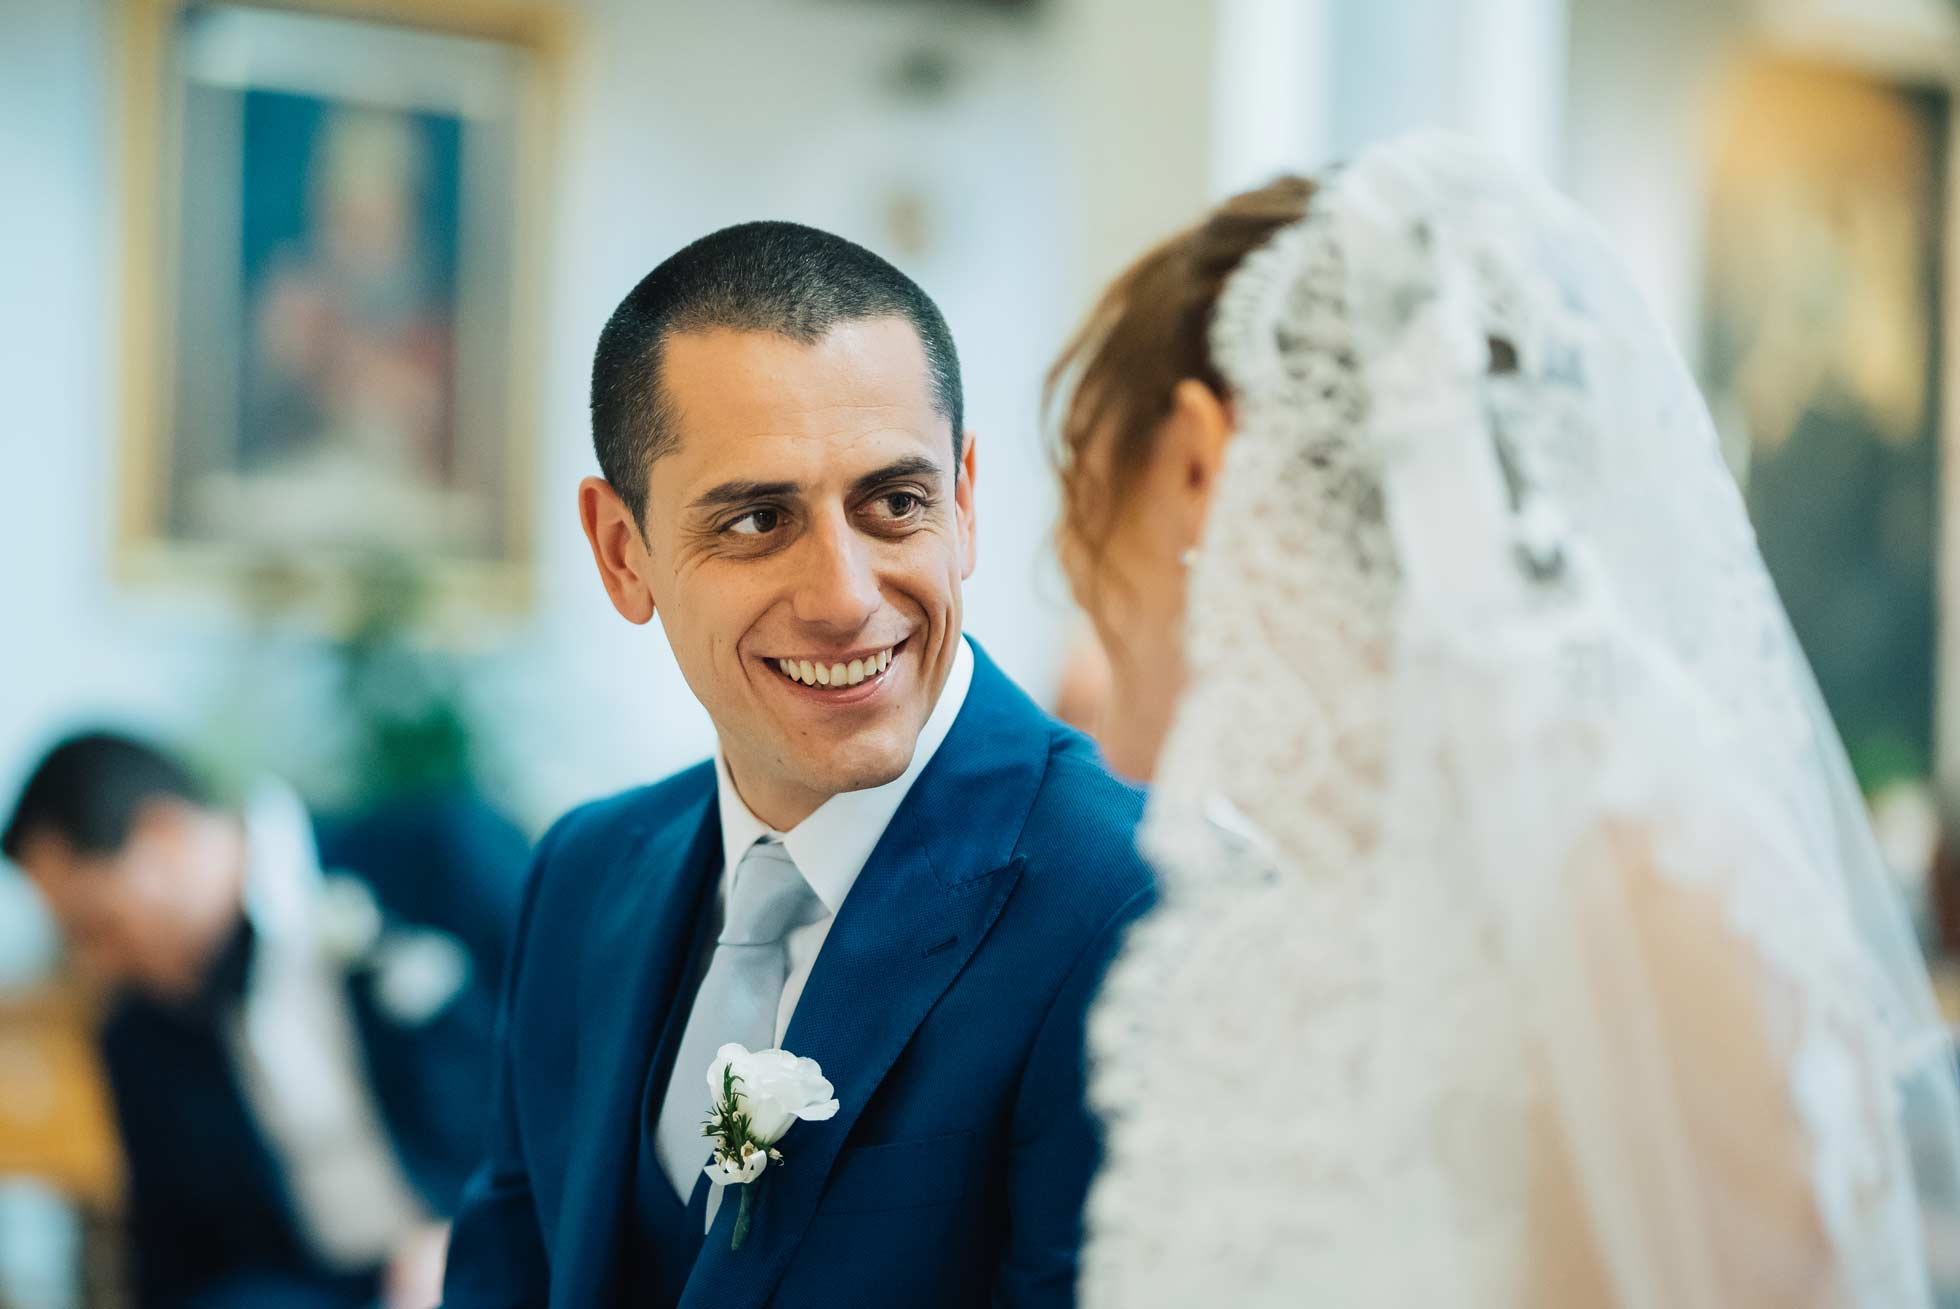 Destination-Wedding-Italy-Wedding-in-Rome-Ceremony